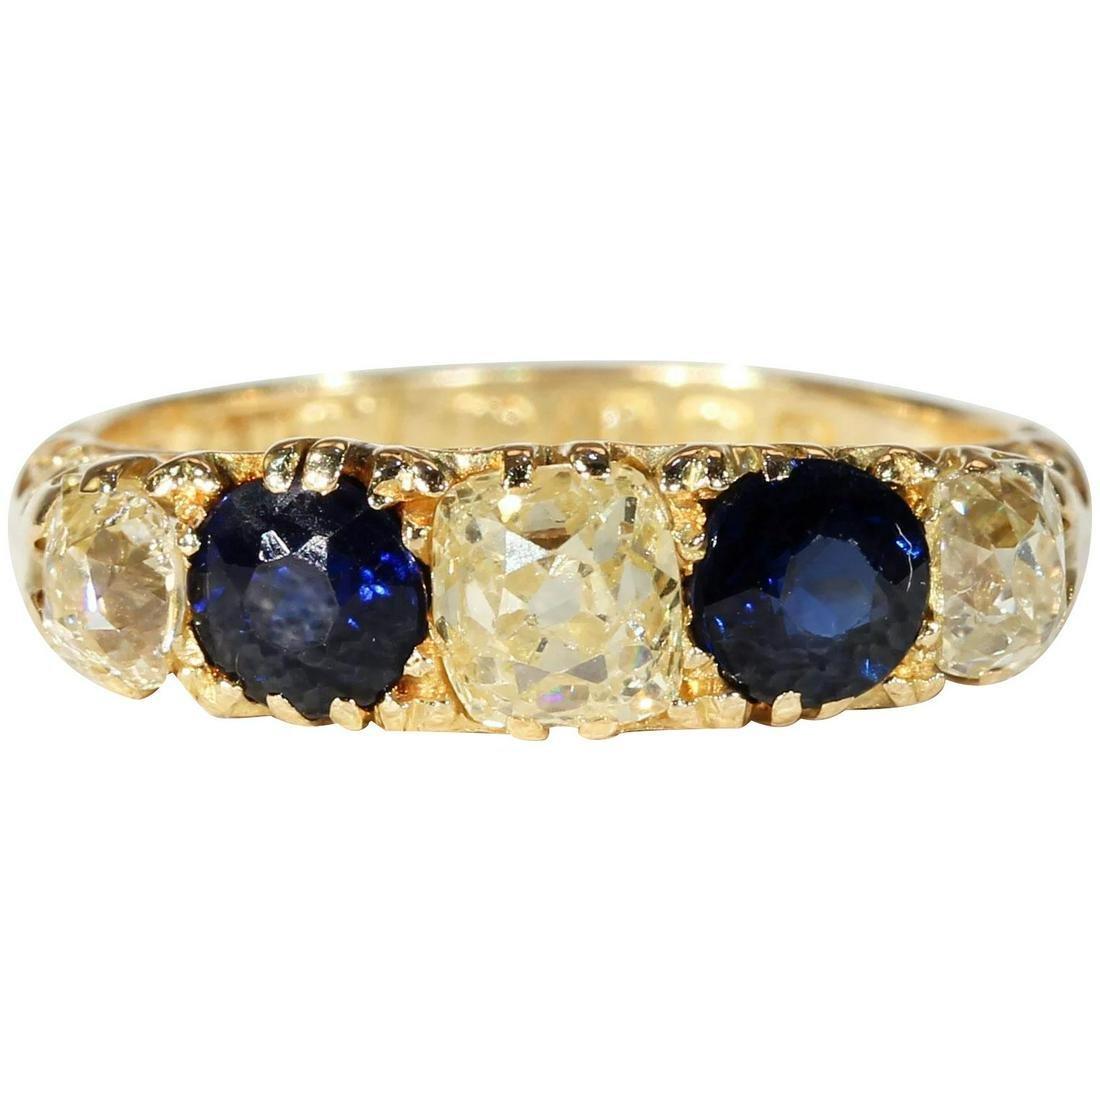 Antique Edwardian Diamond Sapphire Ring Hallmarked 1912